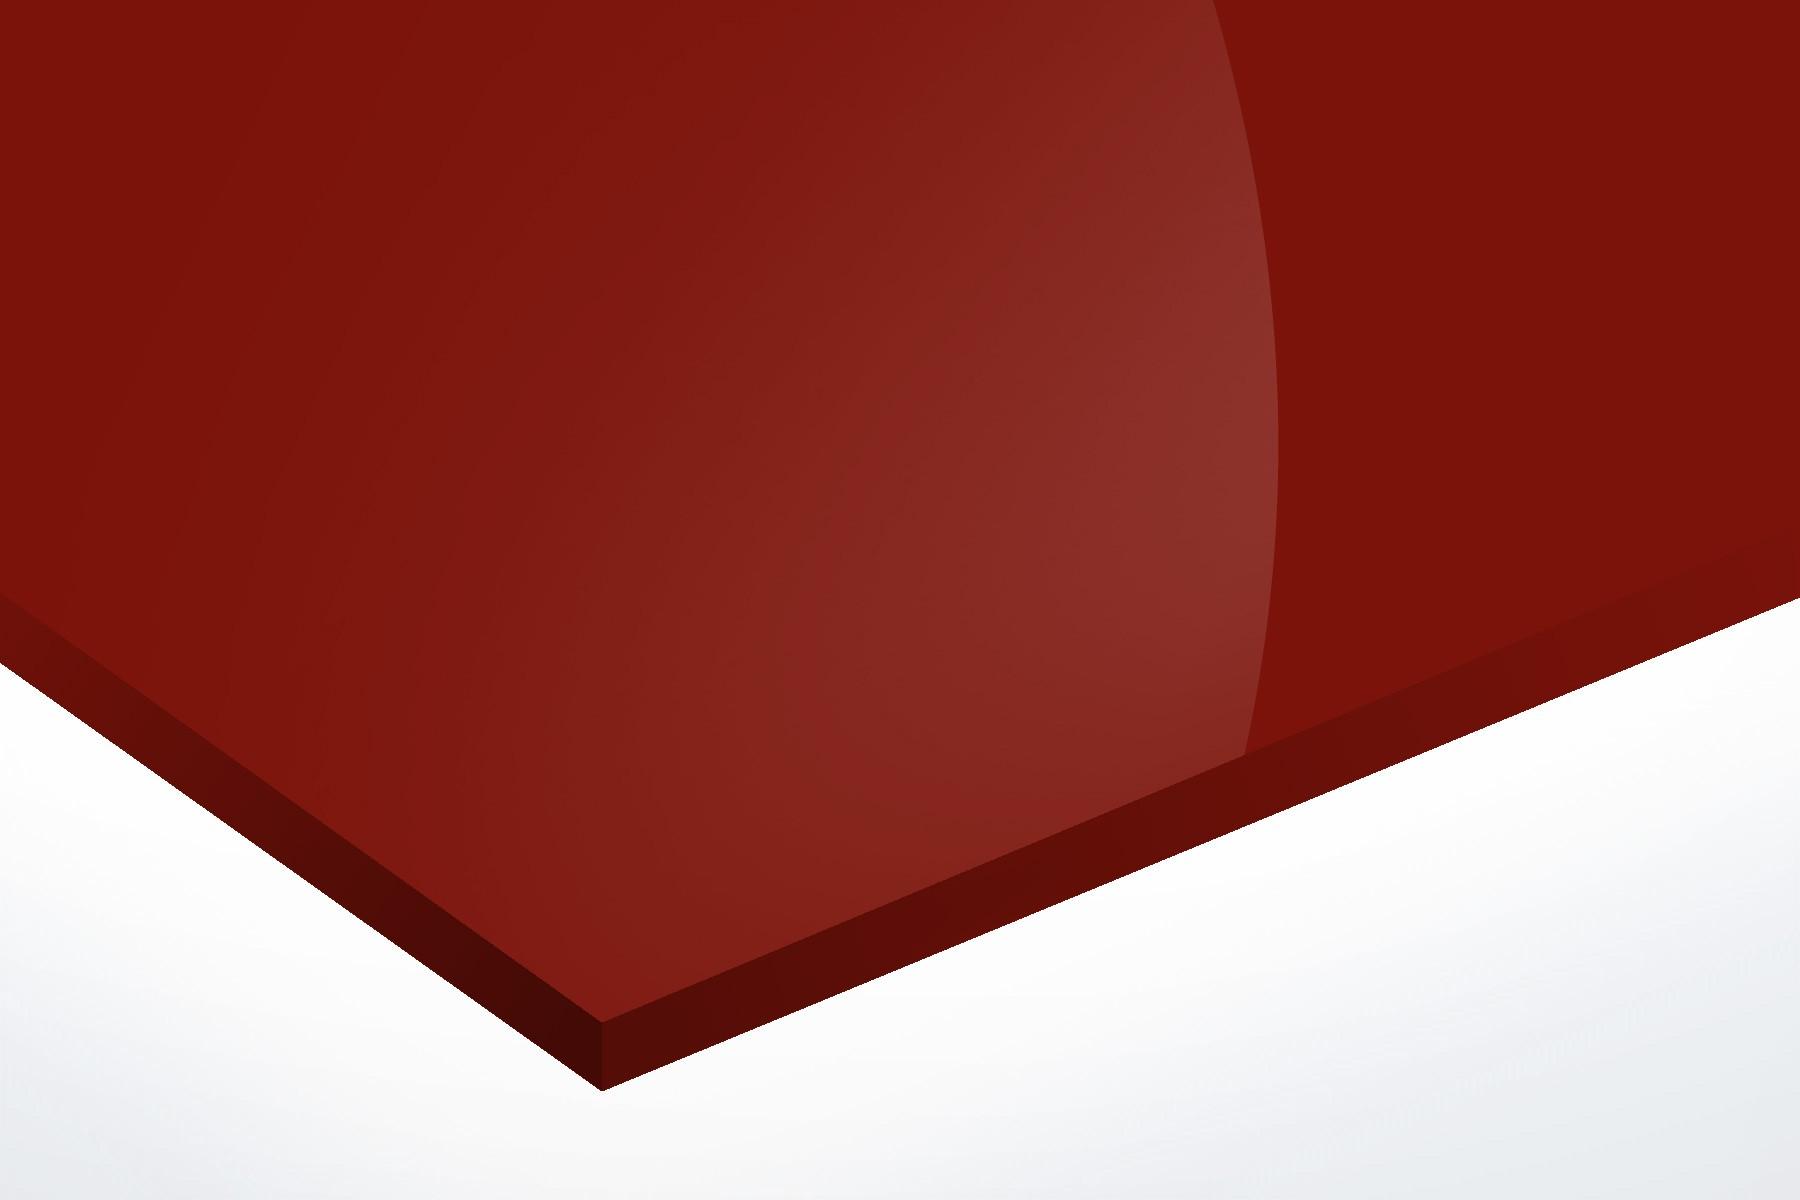 Anodised Aluminium Red, Gloss 1mm x 1000mm x 500mm